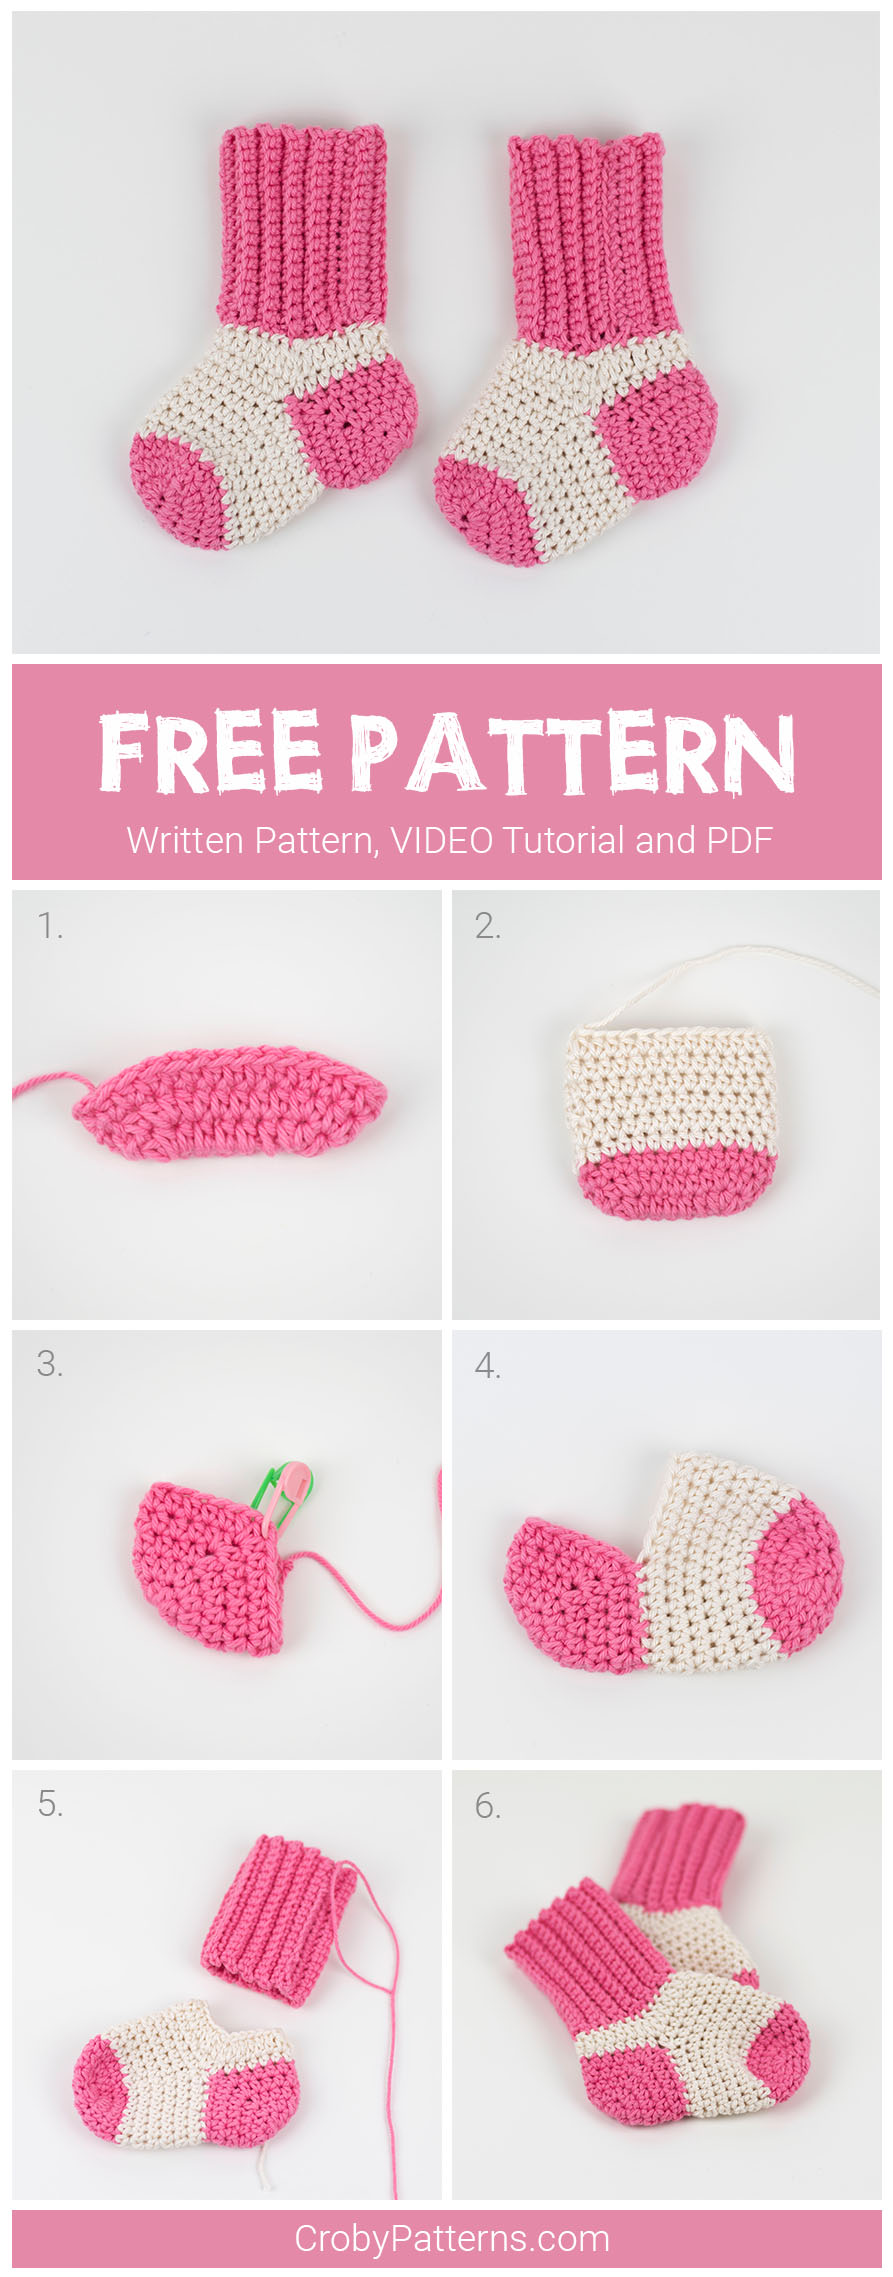 FREE PATTERN: Tiny Socks For Tiny Feet | Croby Patterns